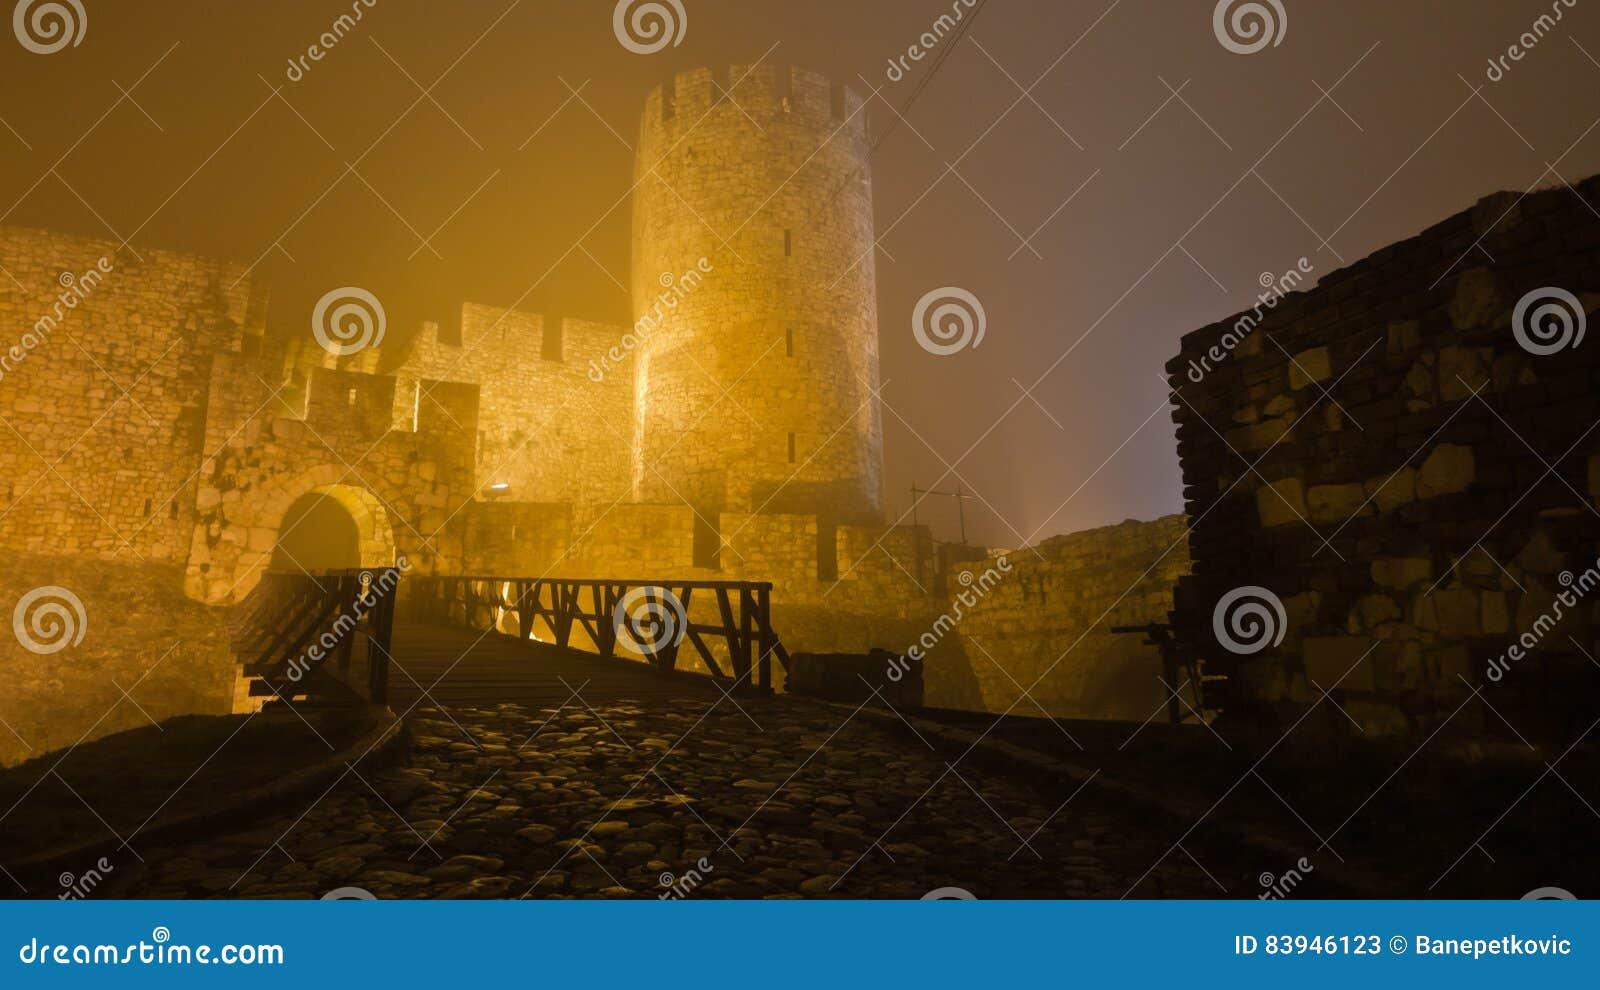 Tower and wooden bridge of Kalemegdan fortress at foggy night in Belgrade